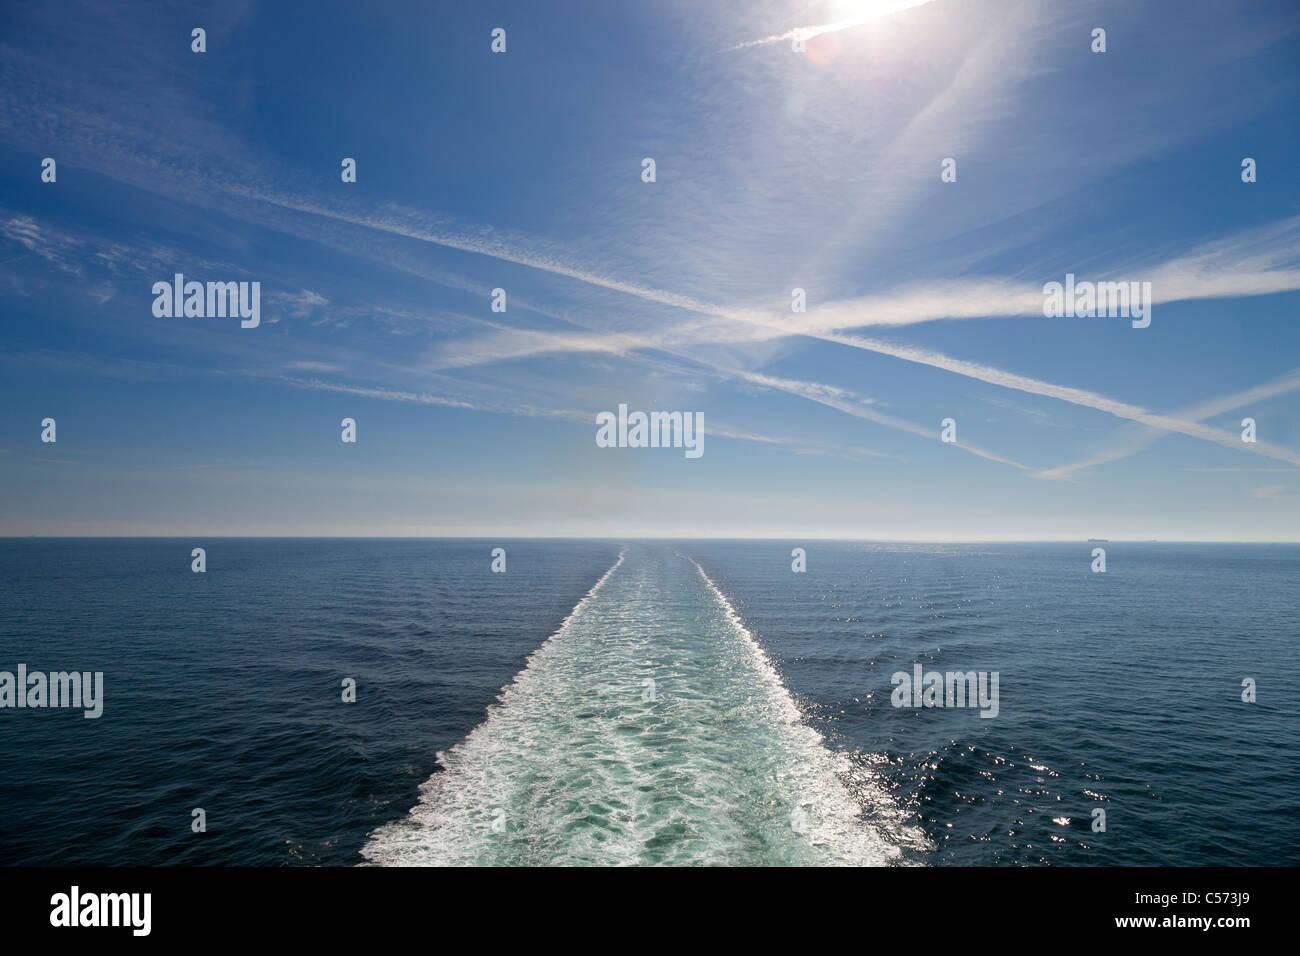 Wake of the cruise liner Azura, Baltic Sea - Stock Image